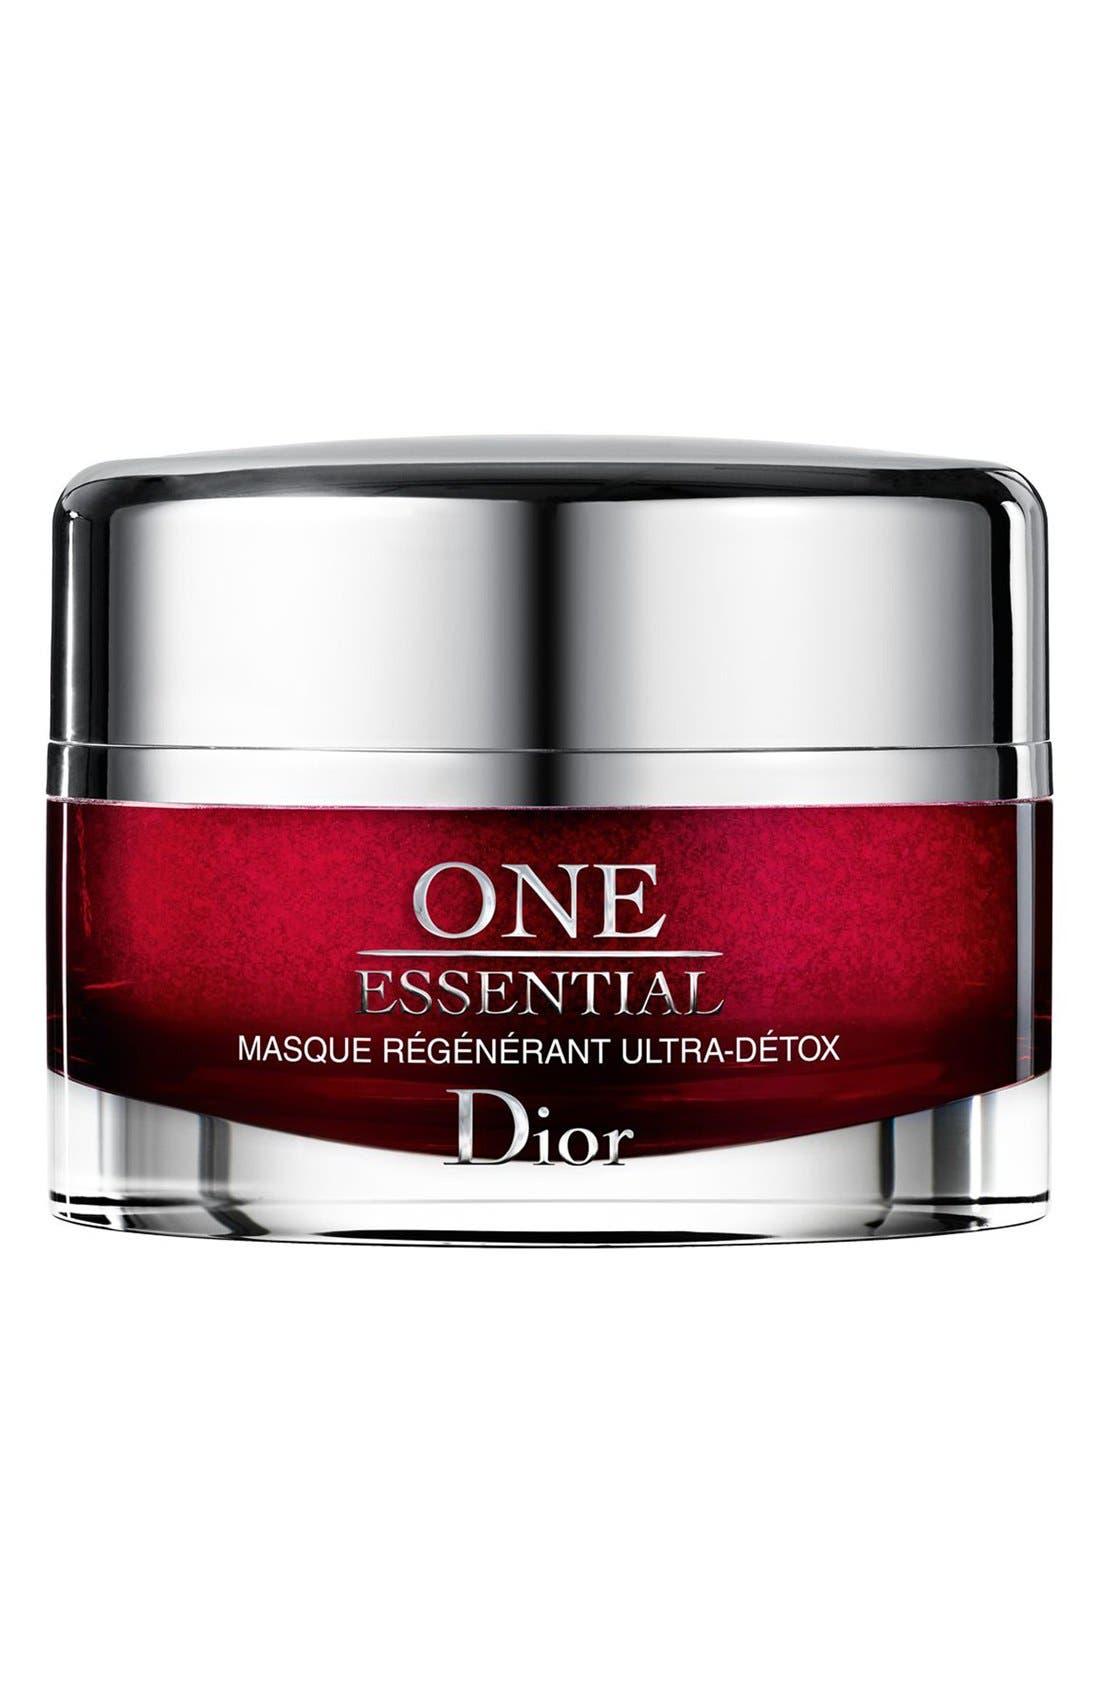 'One Essential' Ultra-Detox Treatment-Mask,                             Main thumbnail 1, color,                             000